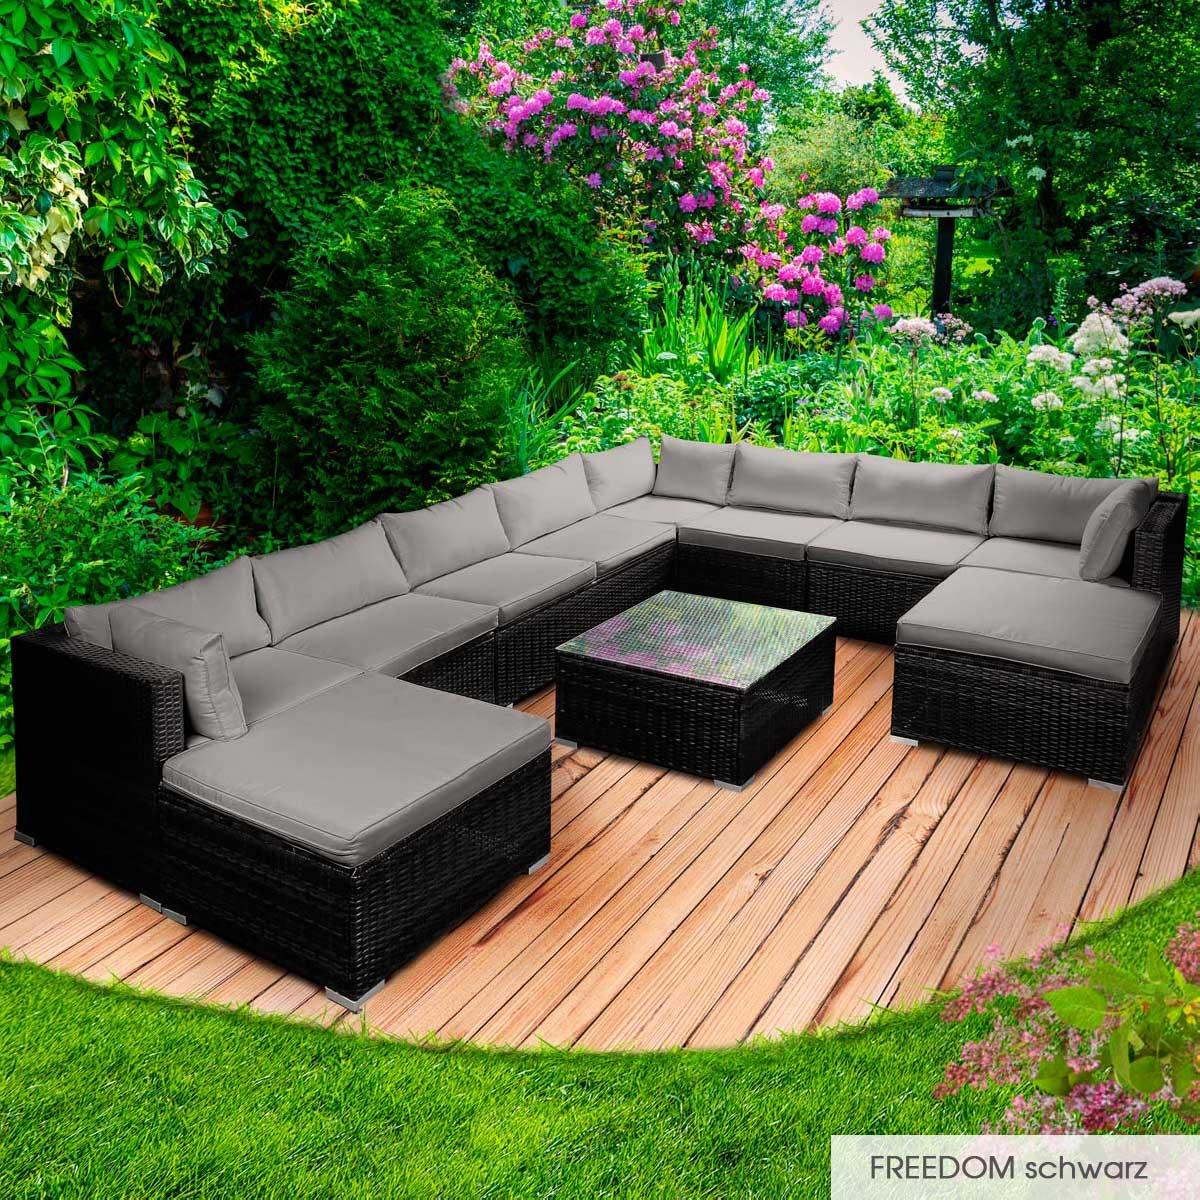 Gartenmoebel-Poly-Rattan-Lounge-Moebel-Sitzgarnitur-Gartengarnitur-Sitzgruppe-Sofa Indexbild 46